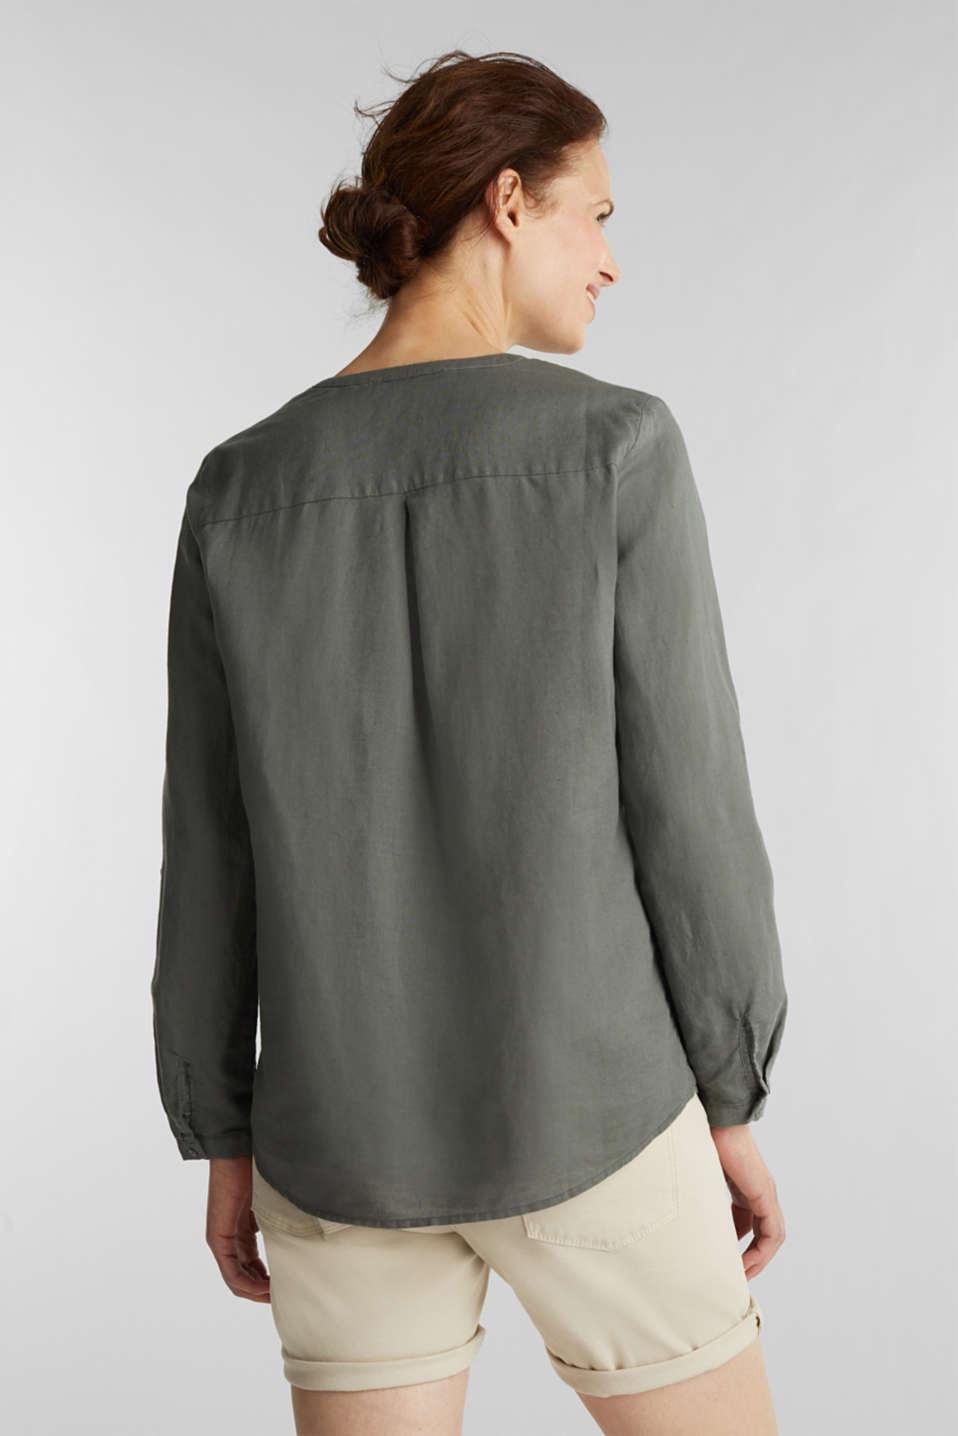 Turn-up blouse in blended linen, KHAKI GREEN, detail image number 3